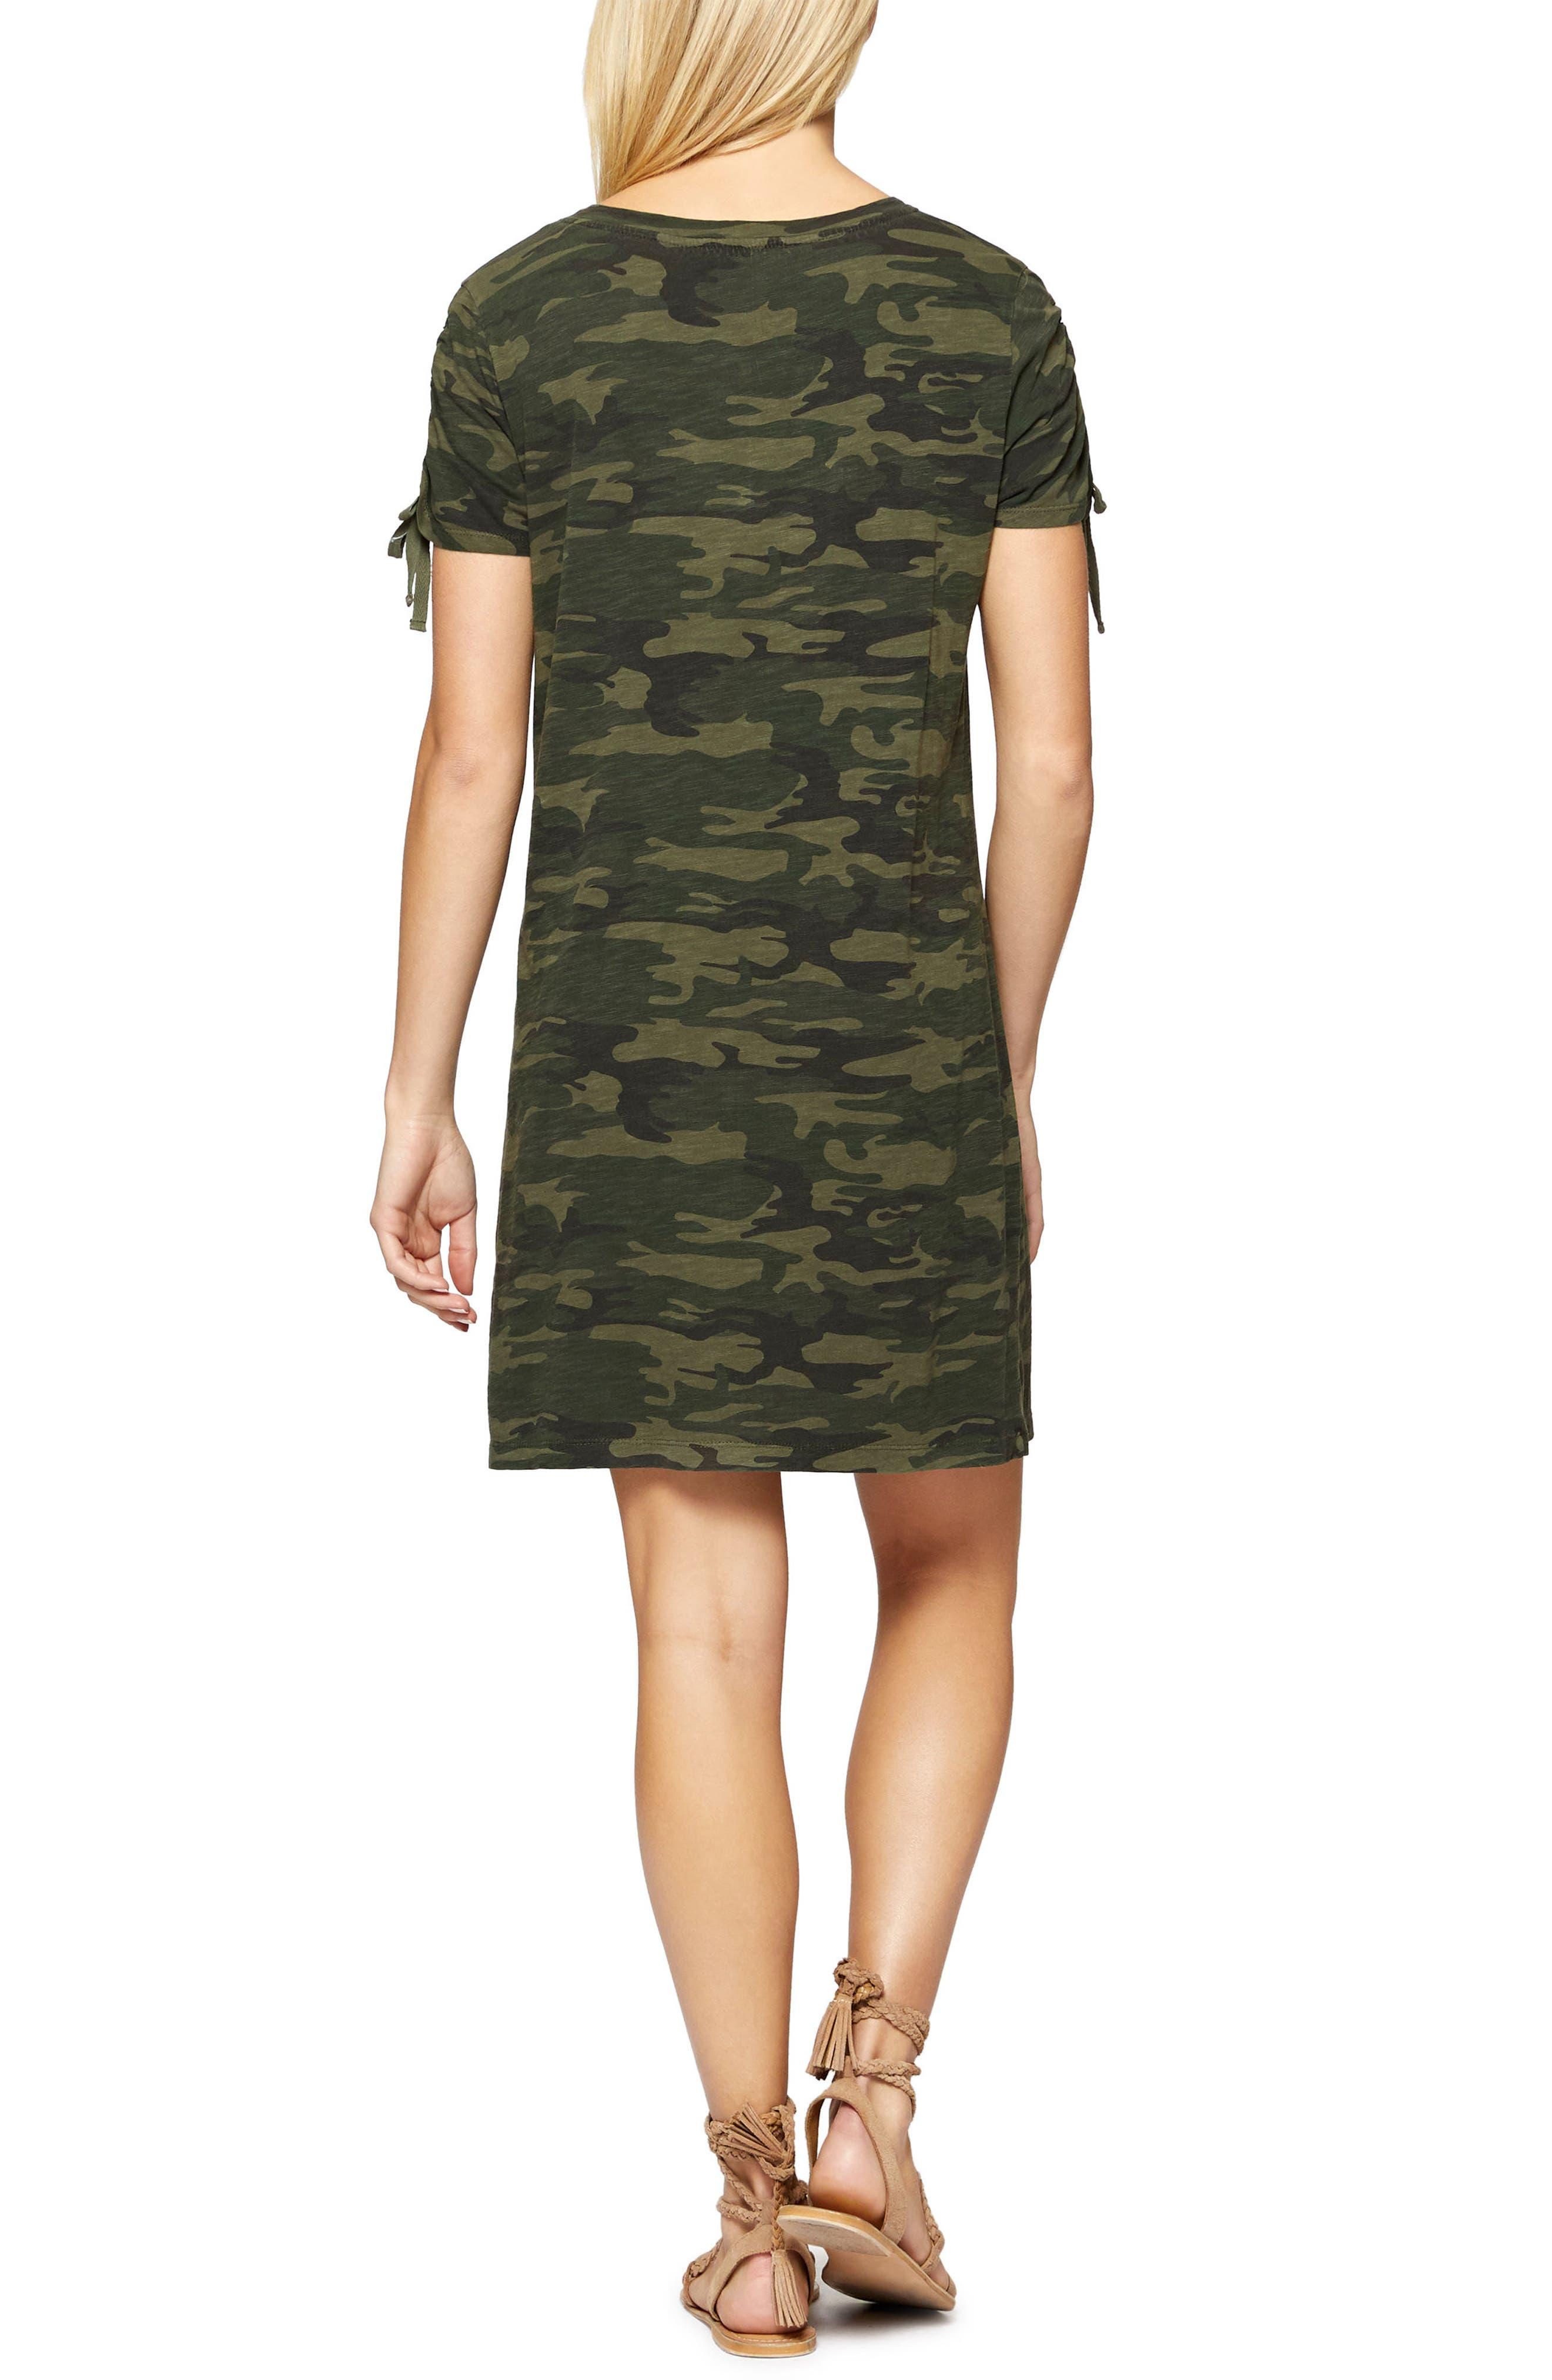 Ojai T-Shirt Dress,                             Alternate thumbnail 2, color,                             MOTHER NATURE CAMO